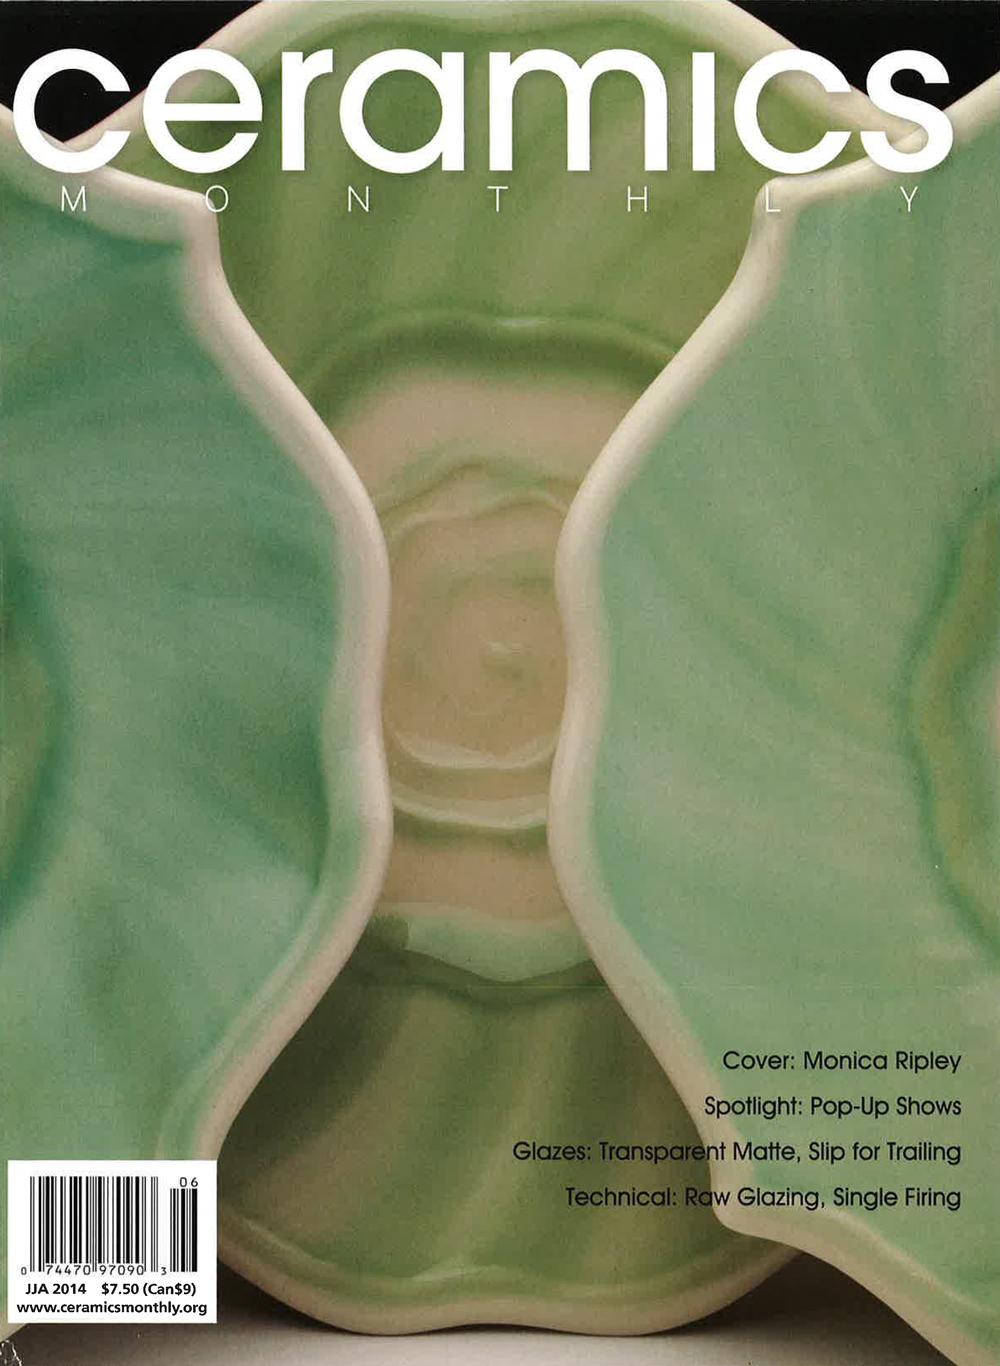 YashaButler_CeramicsMonthly_June2014_Cover_WEB.jpg